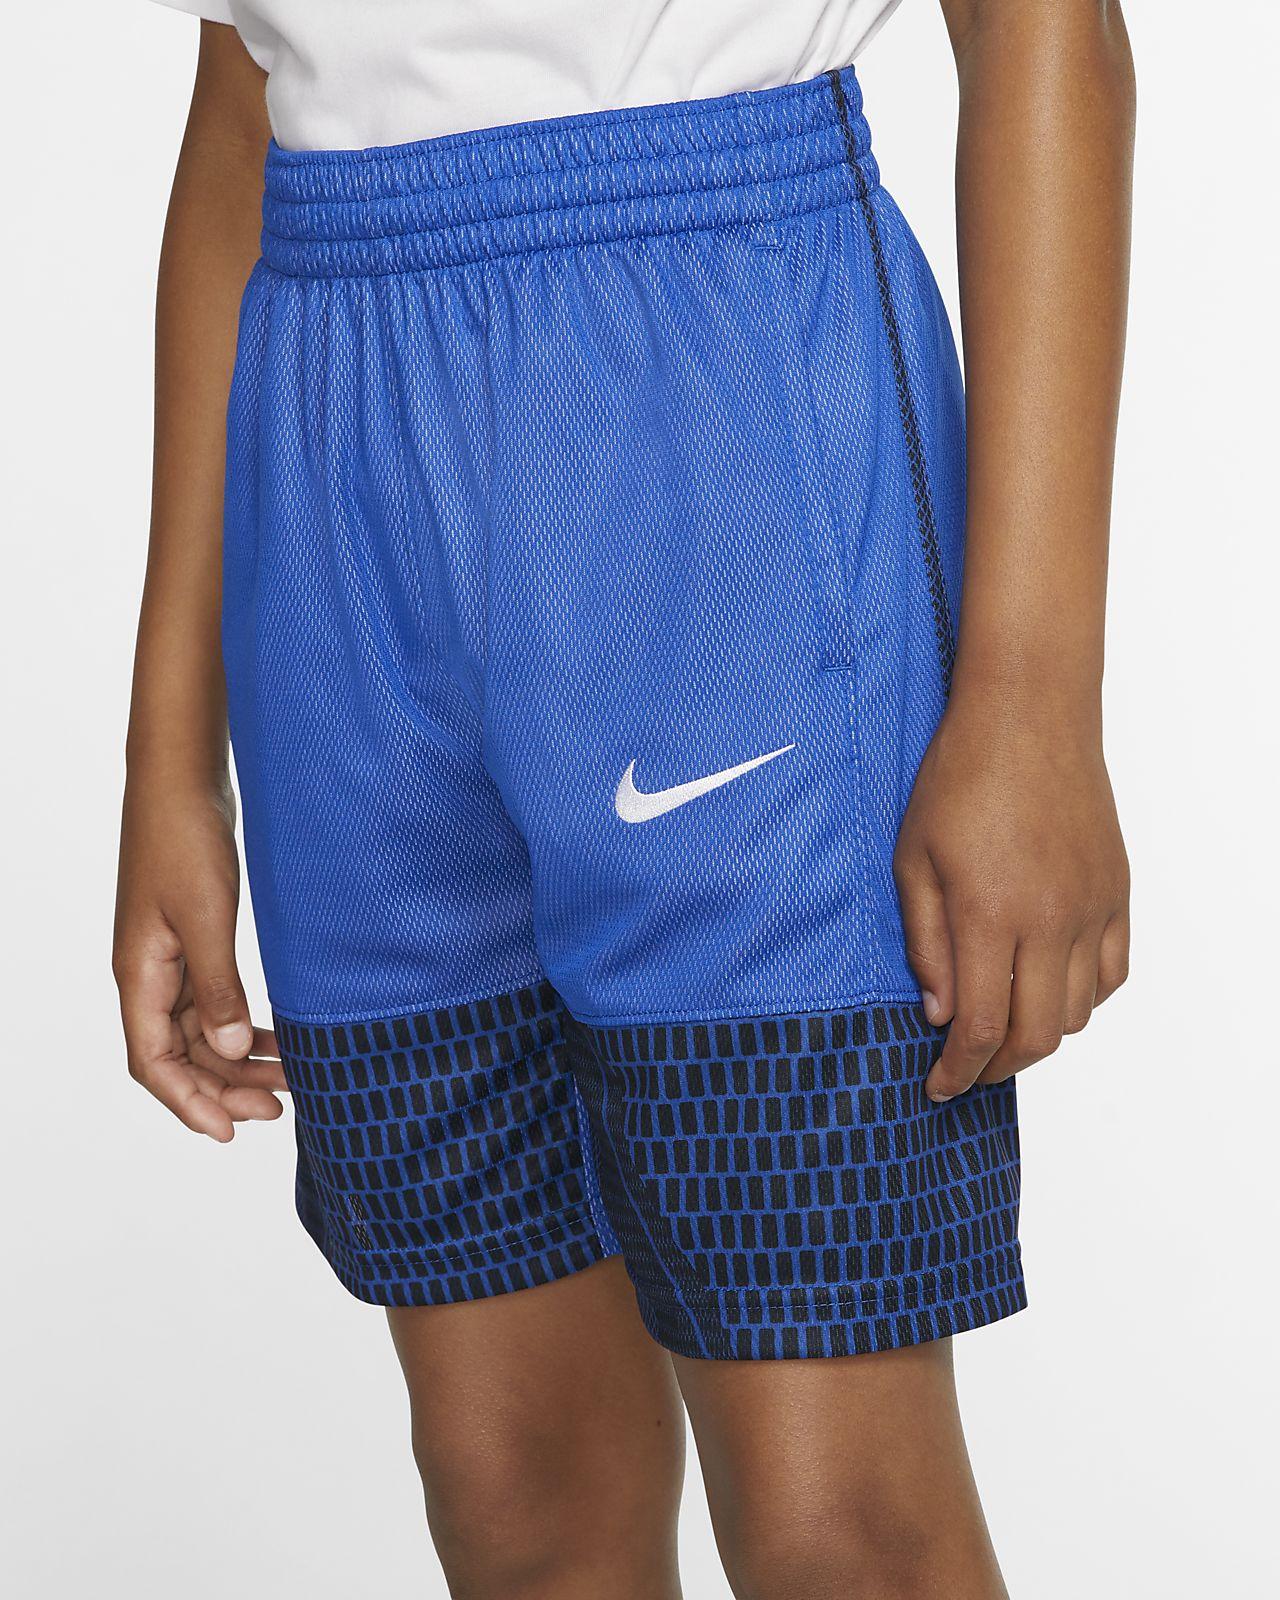 Nike Boys' Printed Basketball Shorts